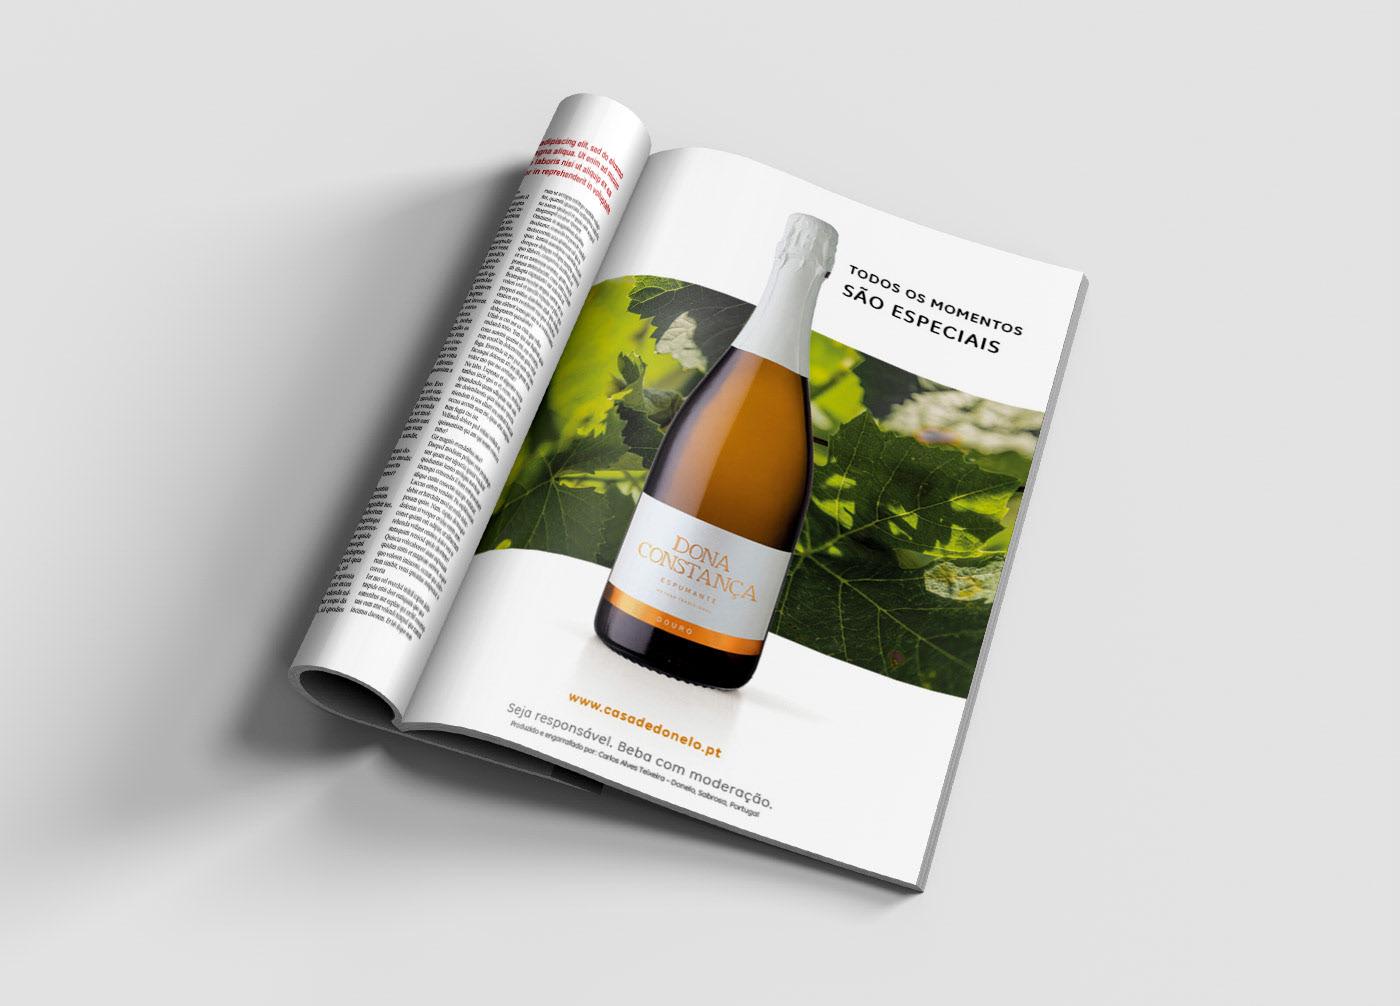 wine, casa de donelo, branding, labelling